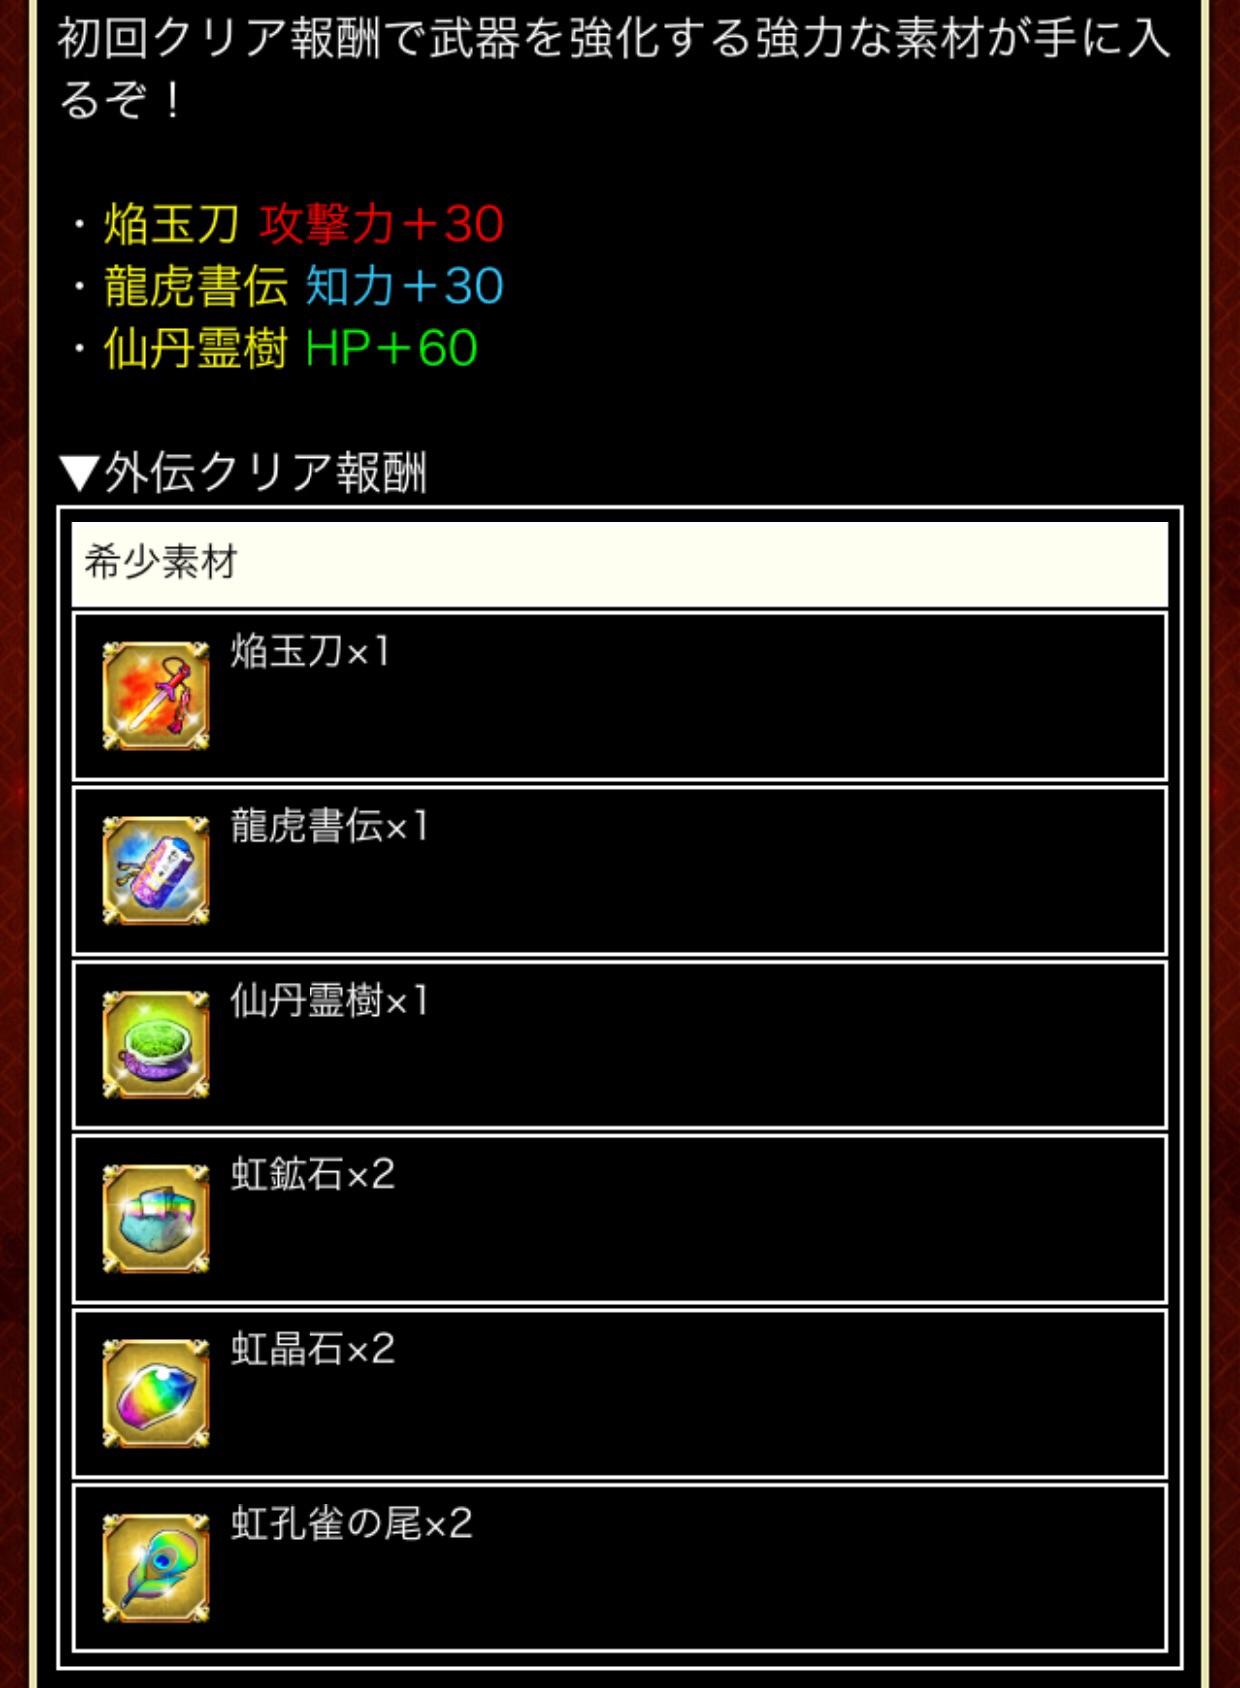 20160413231540a8c.jpg